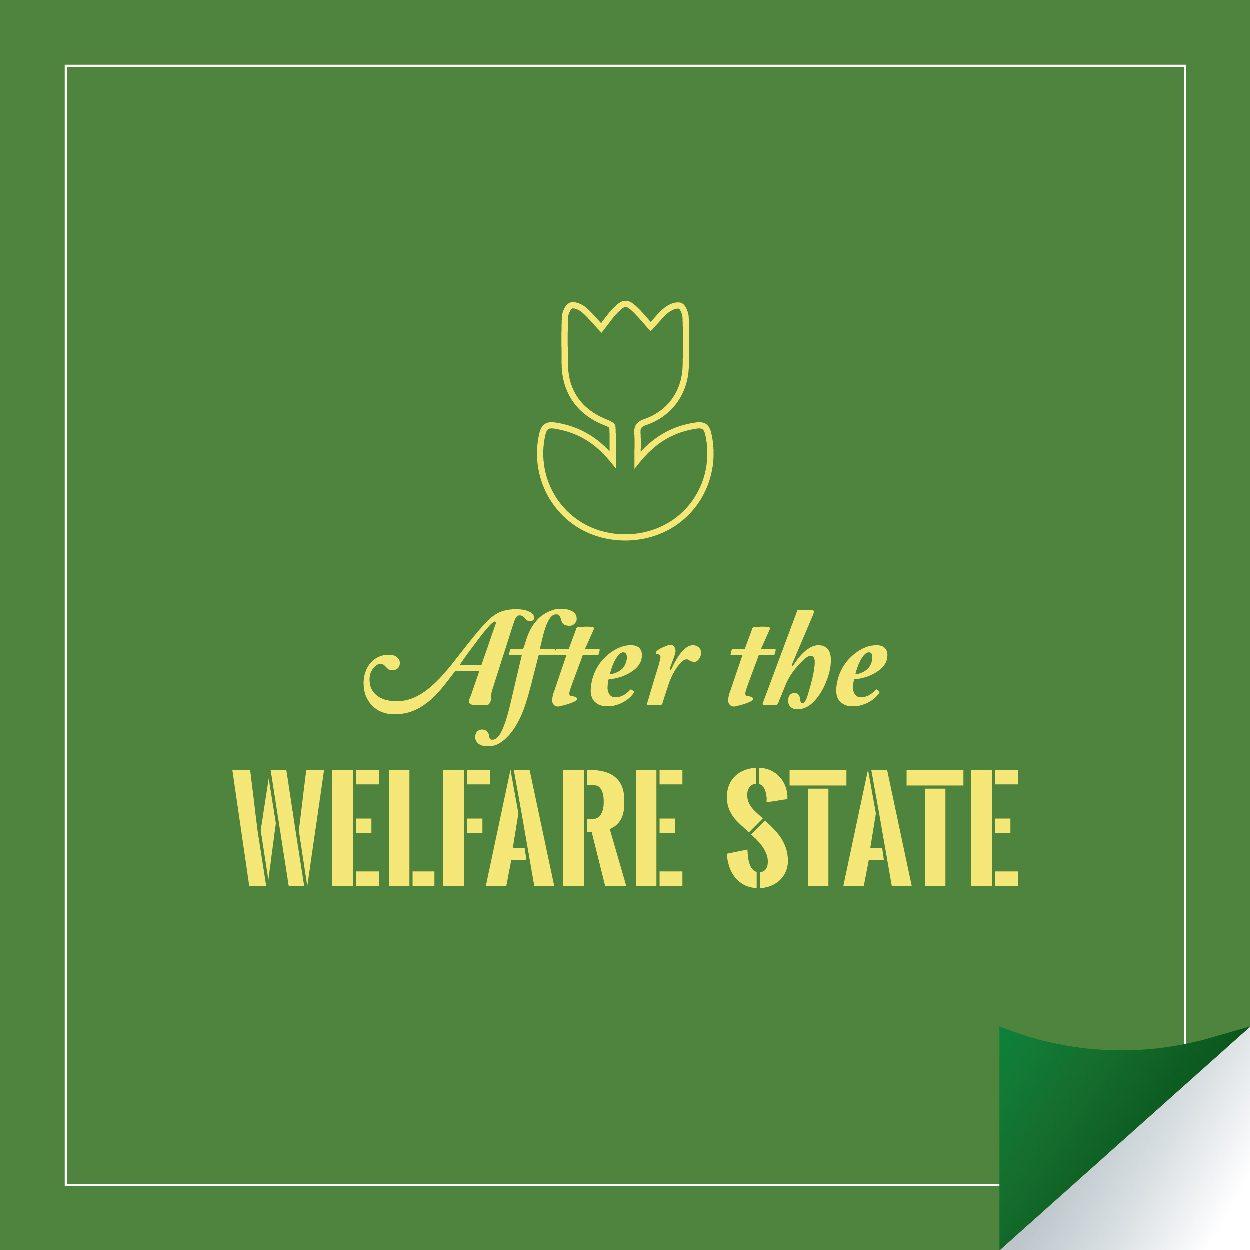 literature_welfare